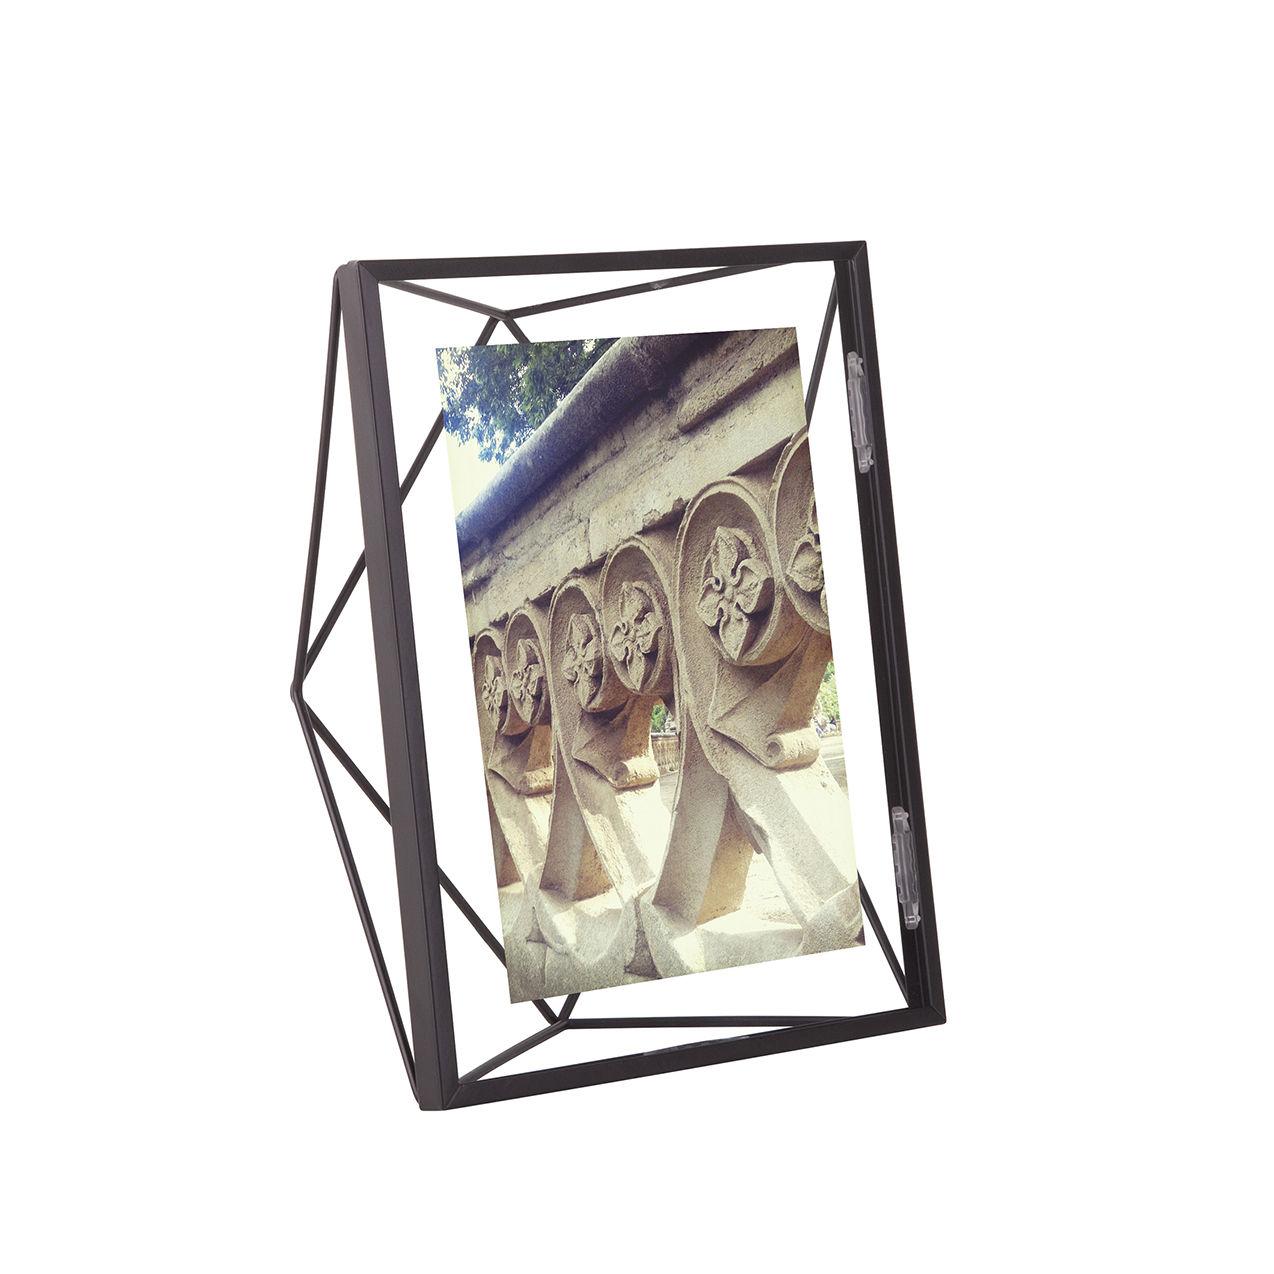 Prisma fotolijst Umbra 18x23cm zwart